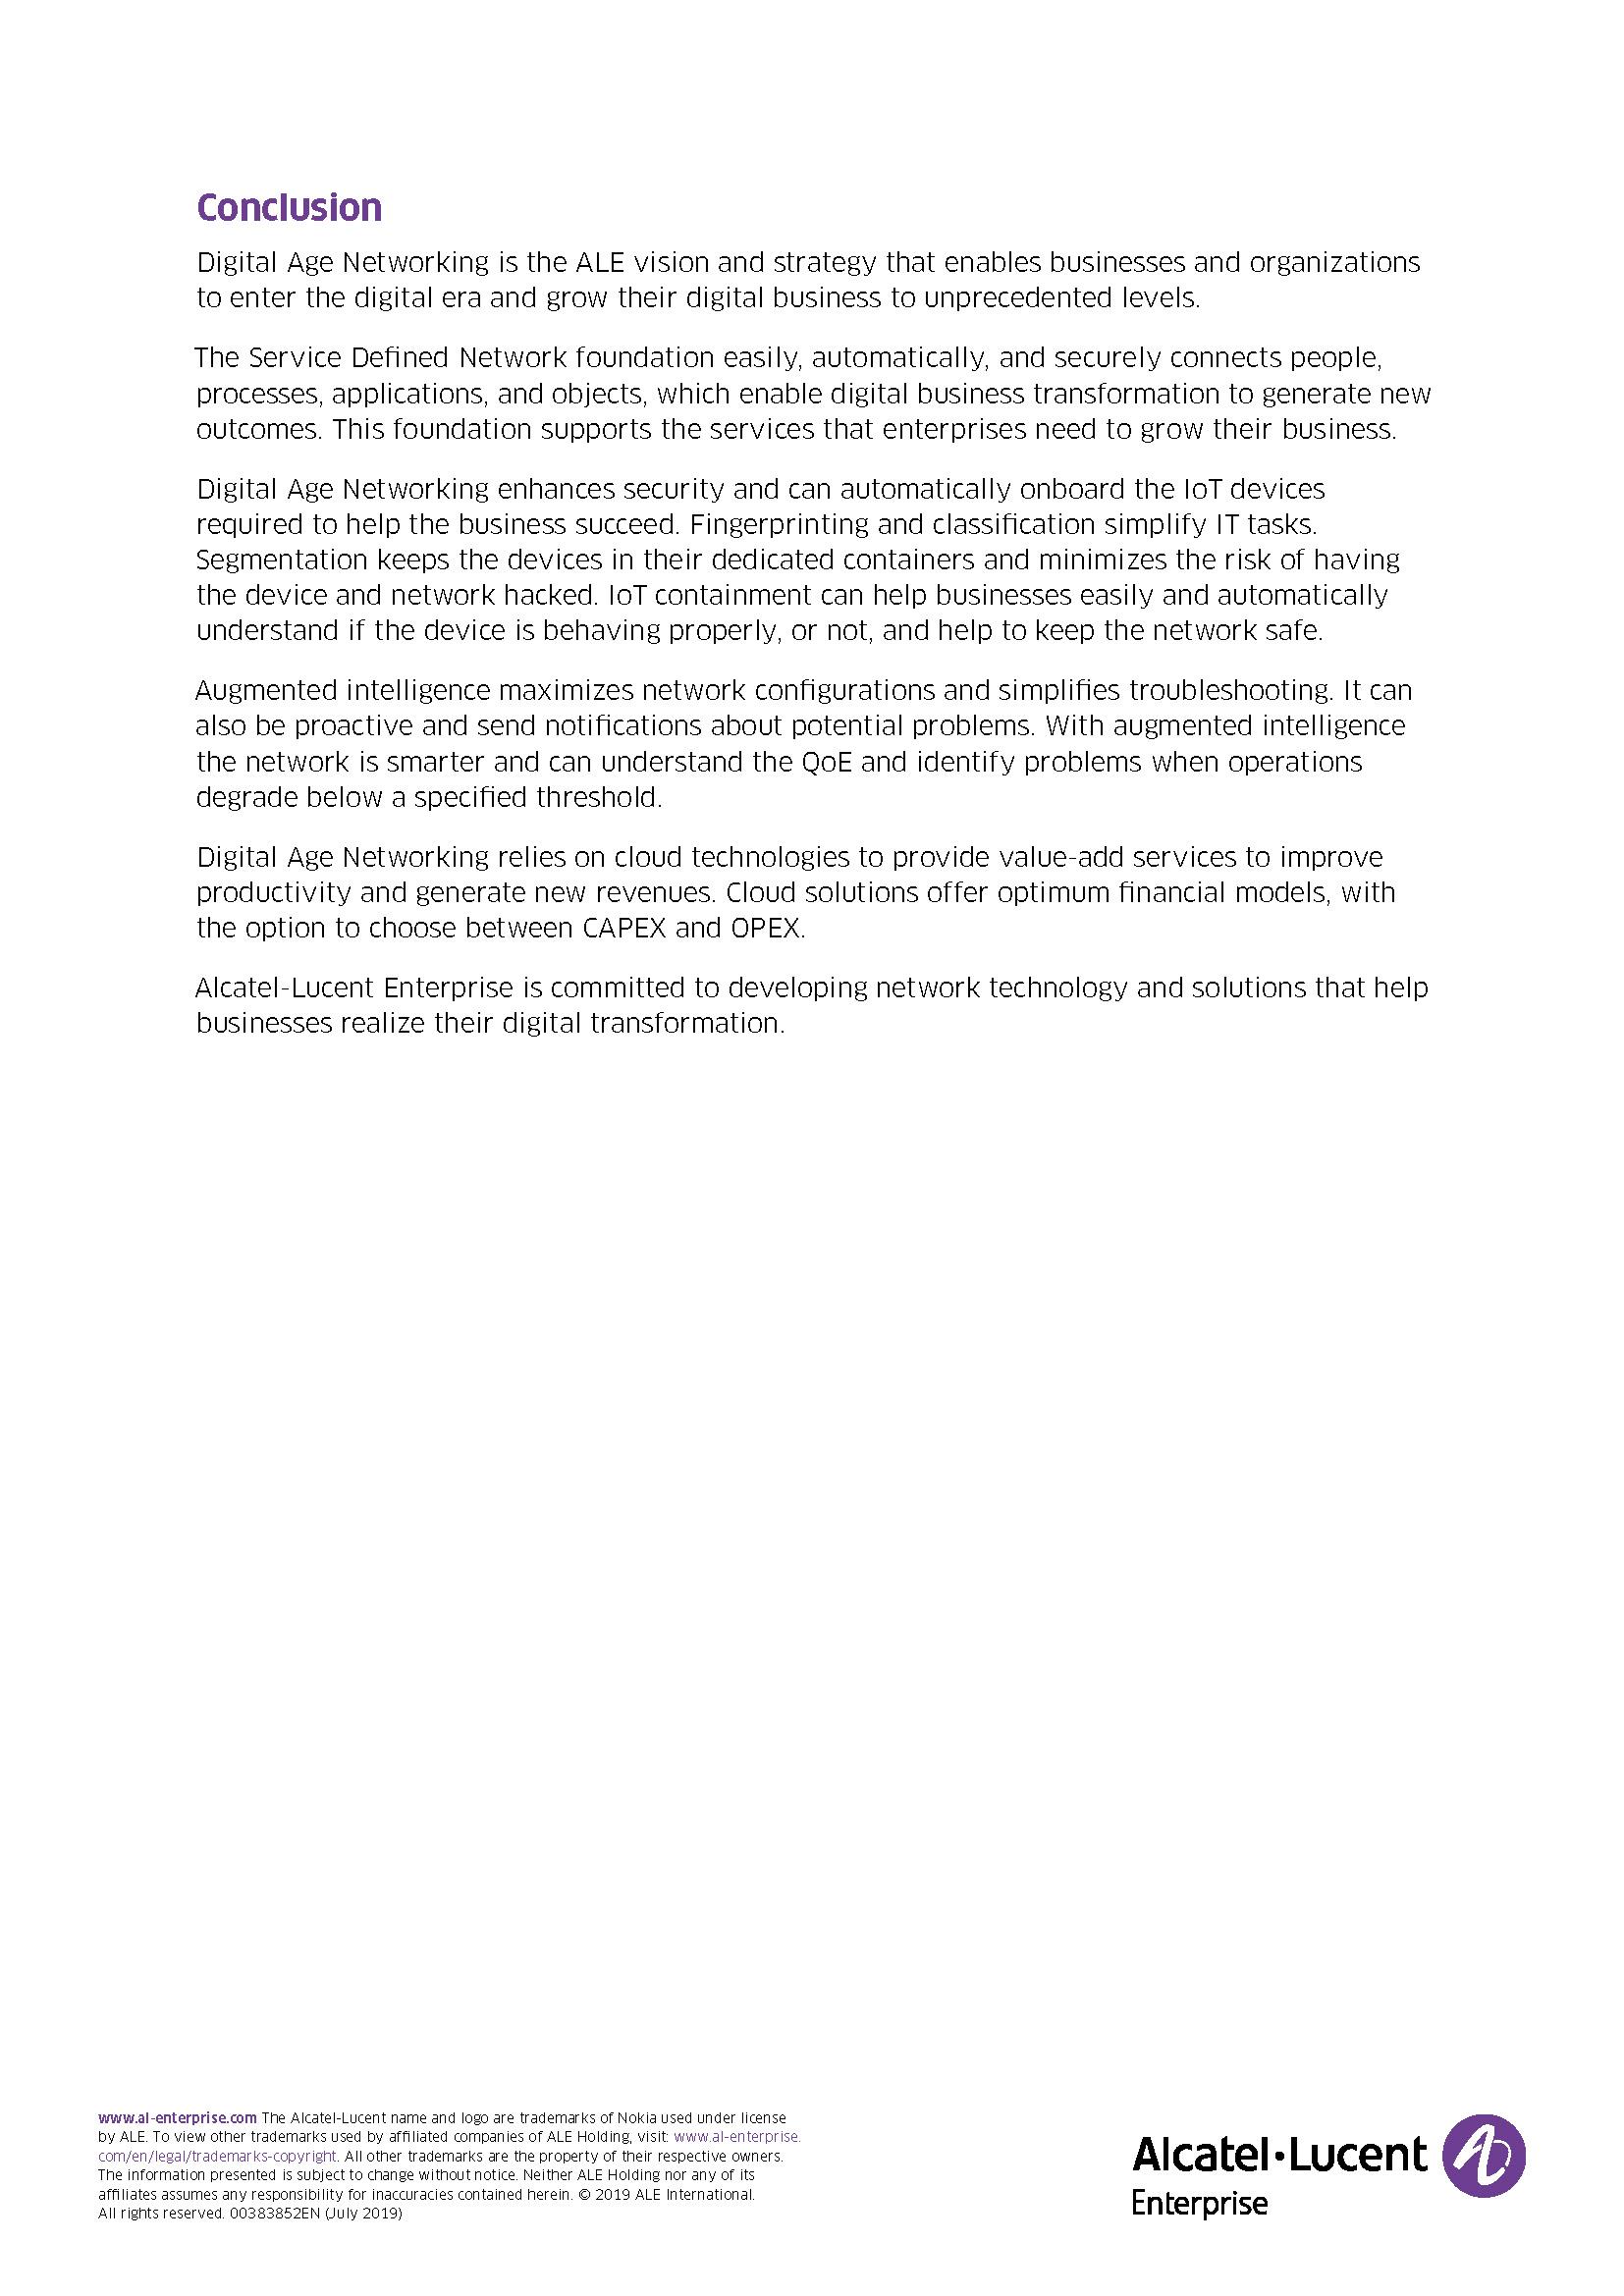 digital-age-networking-enterprises_Page_14